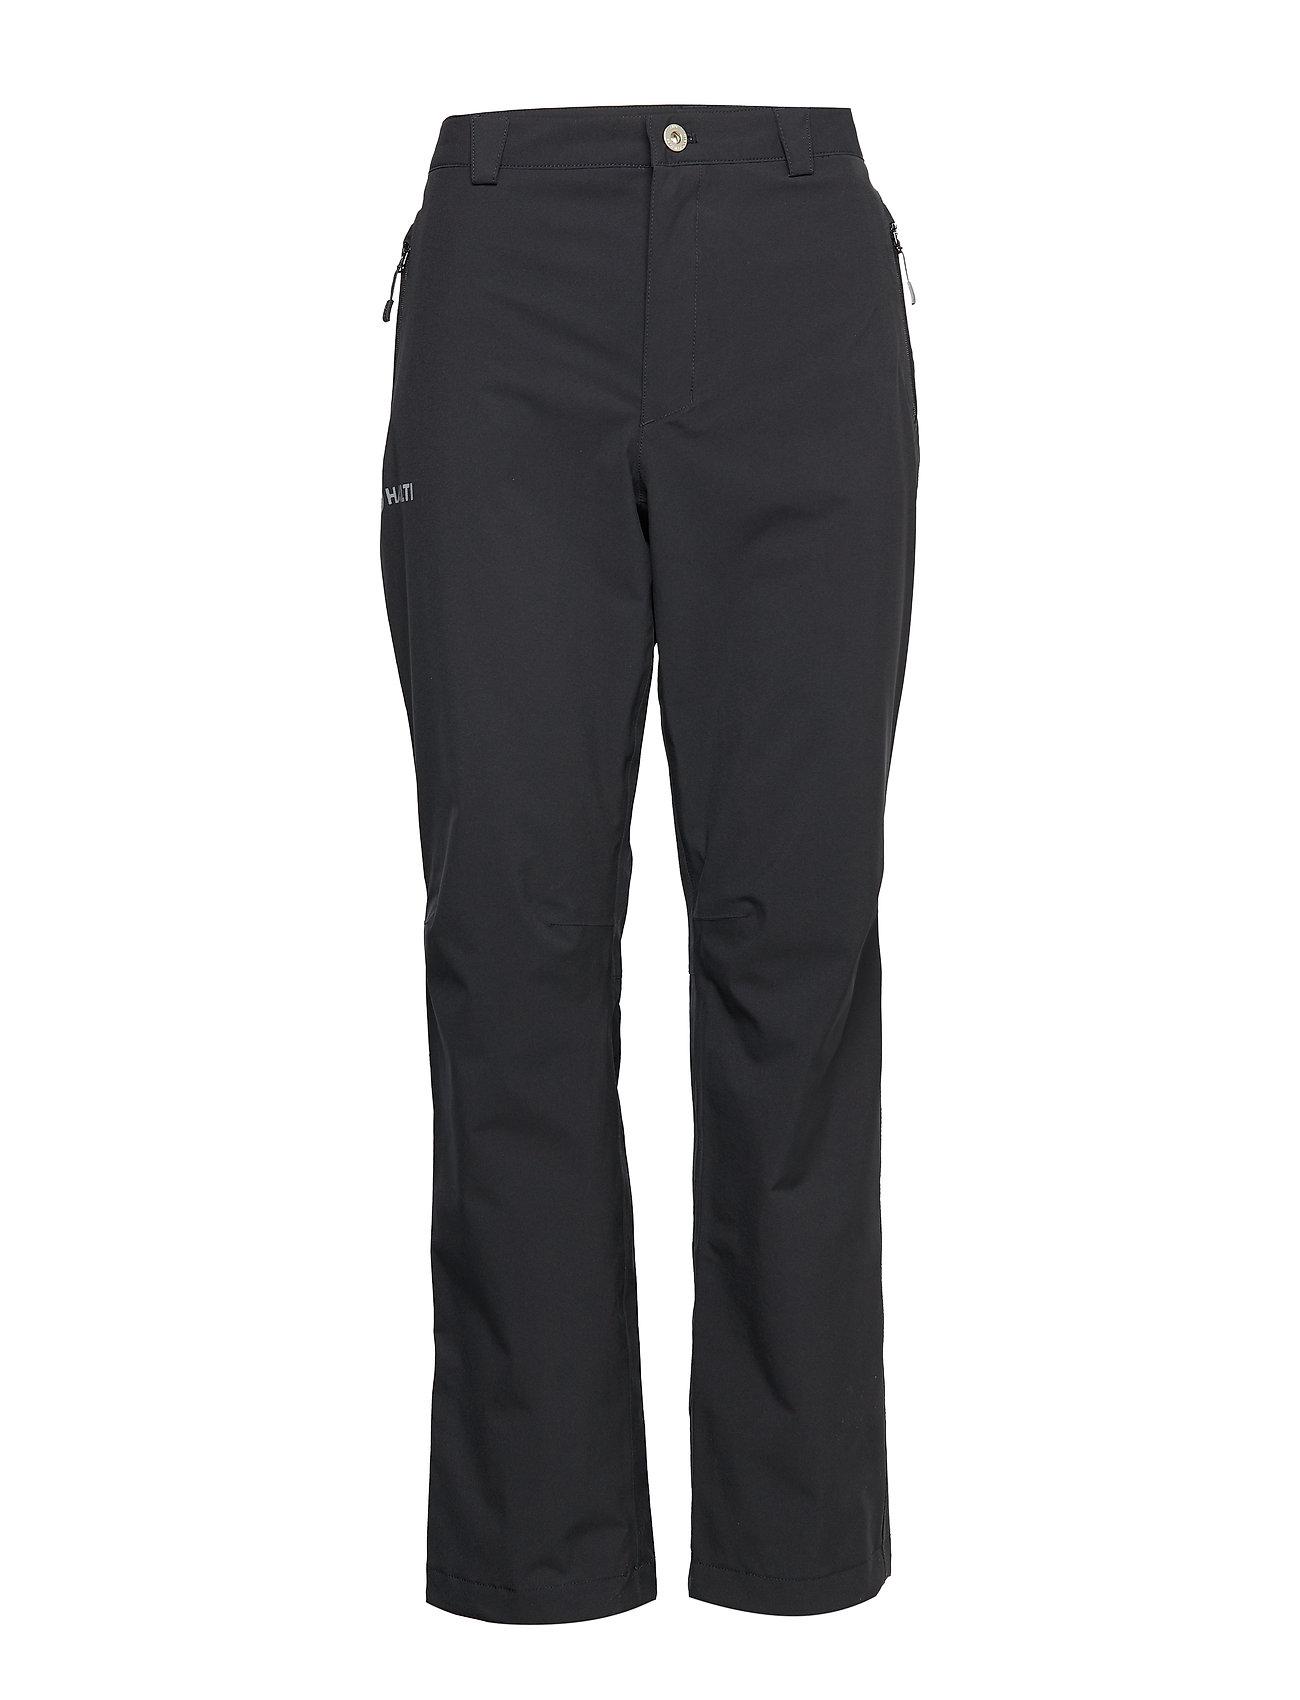 Halti Leisti W + short Pants